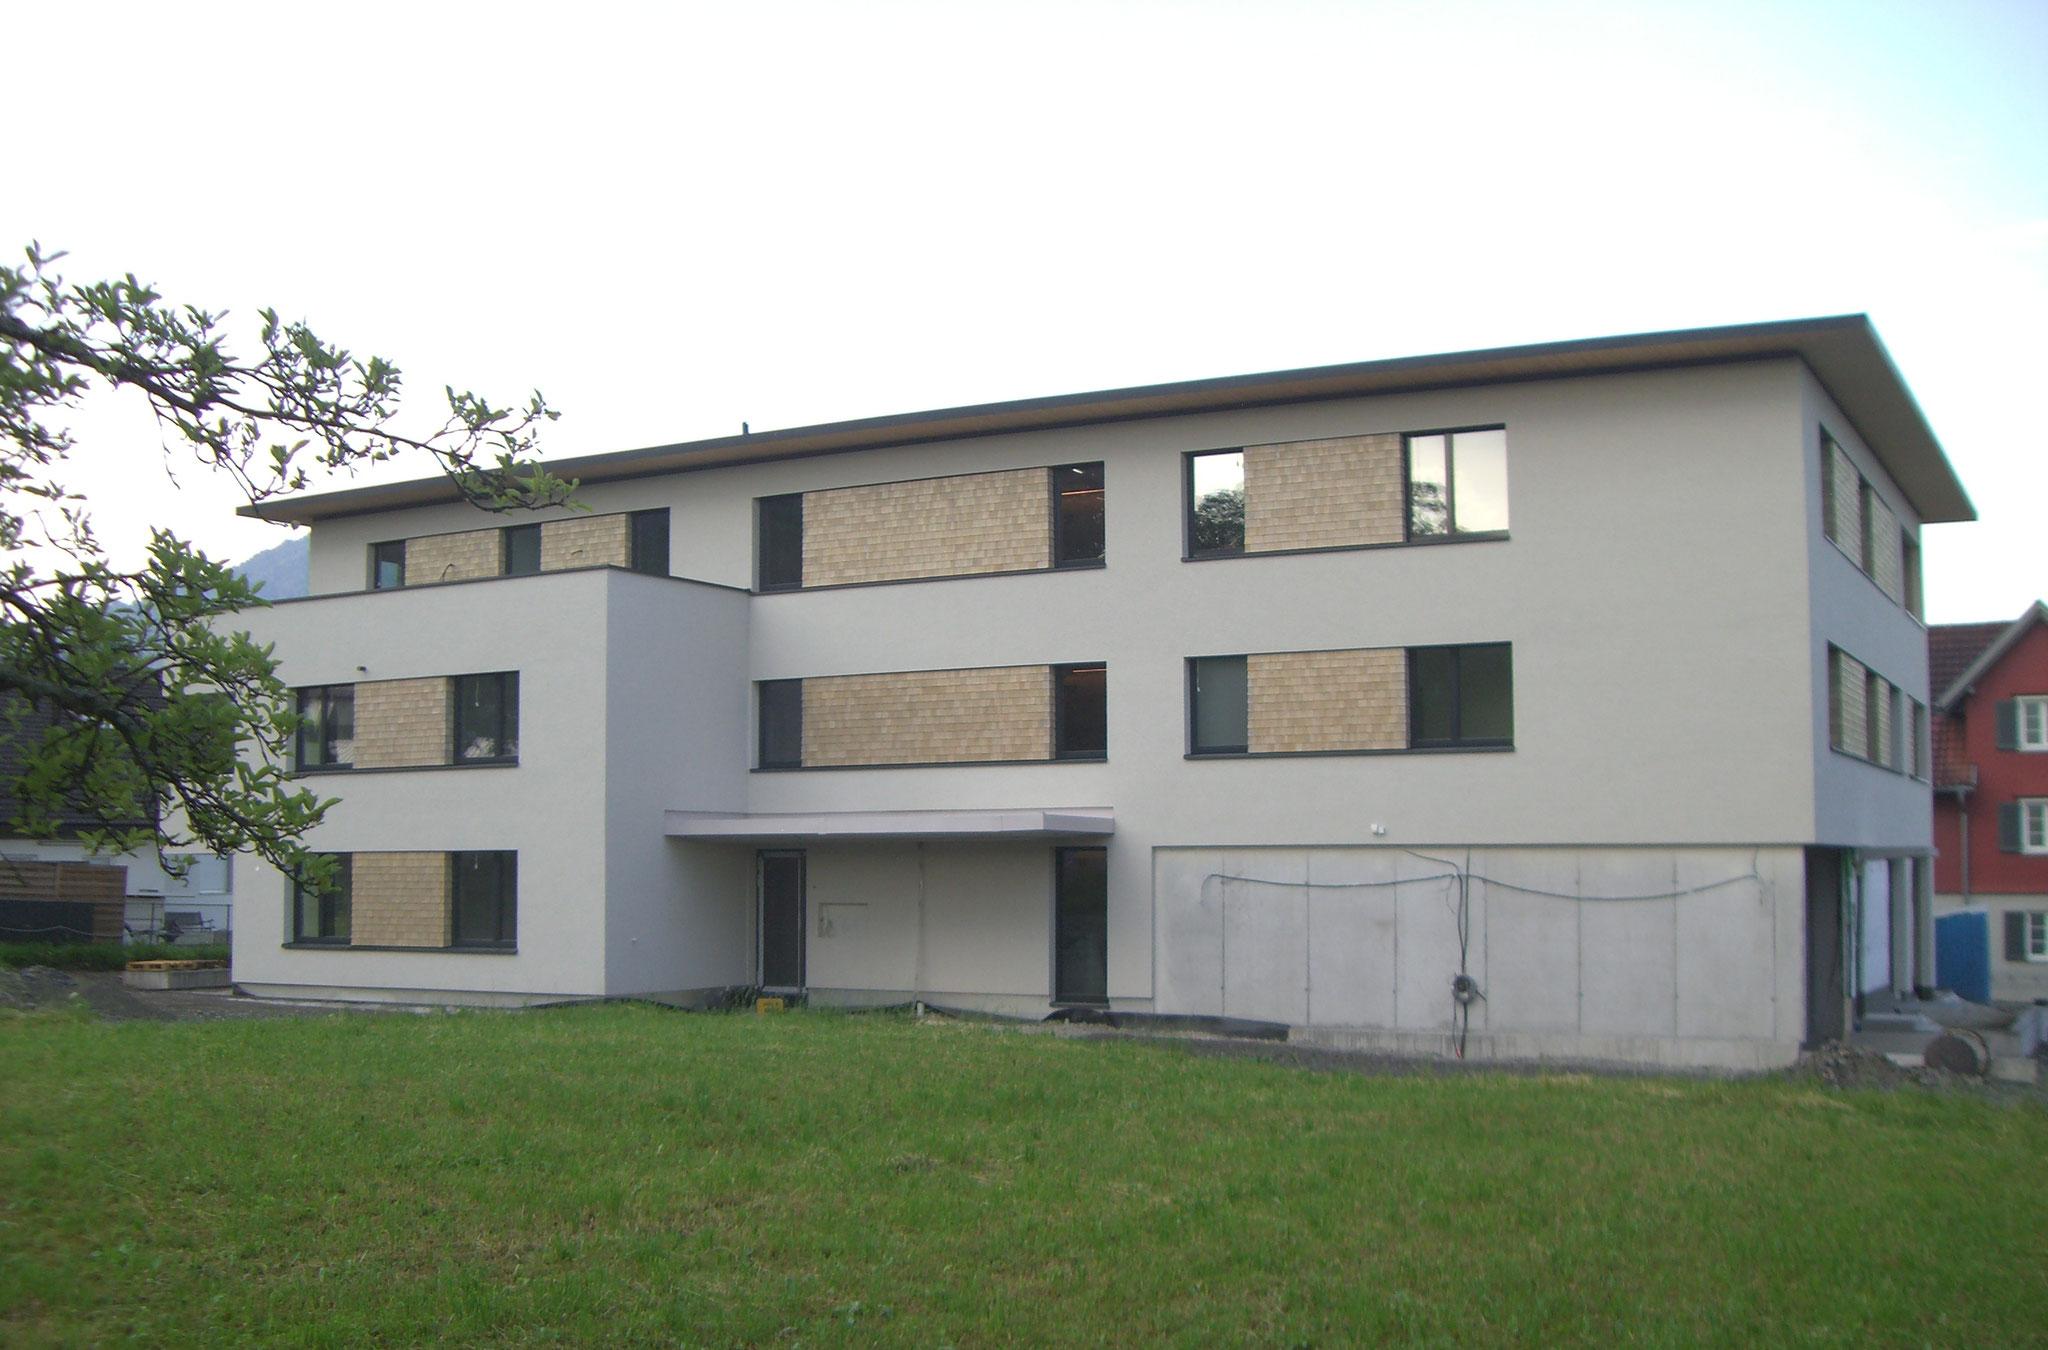 WA Feldgasse Dornbirn, Bauherr: Hilbe Bauträger GmbH